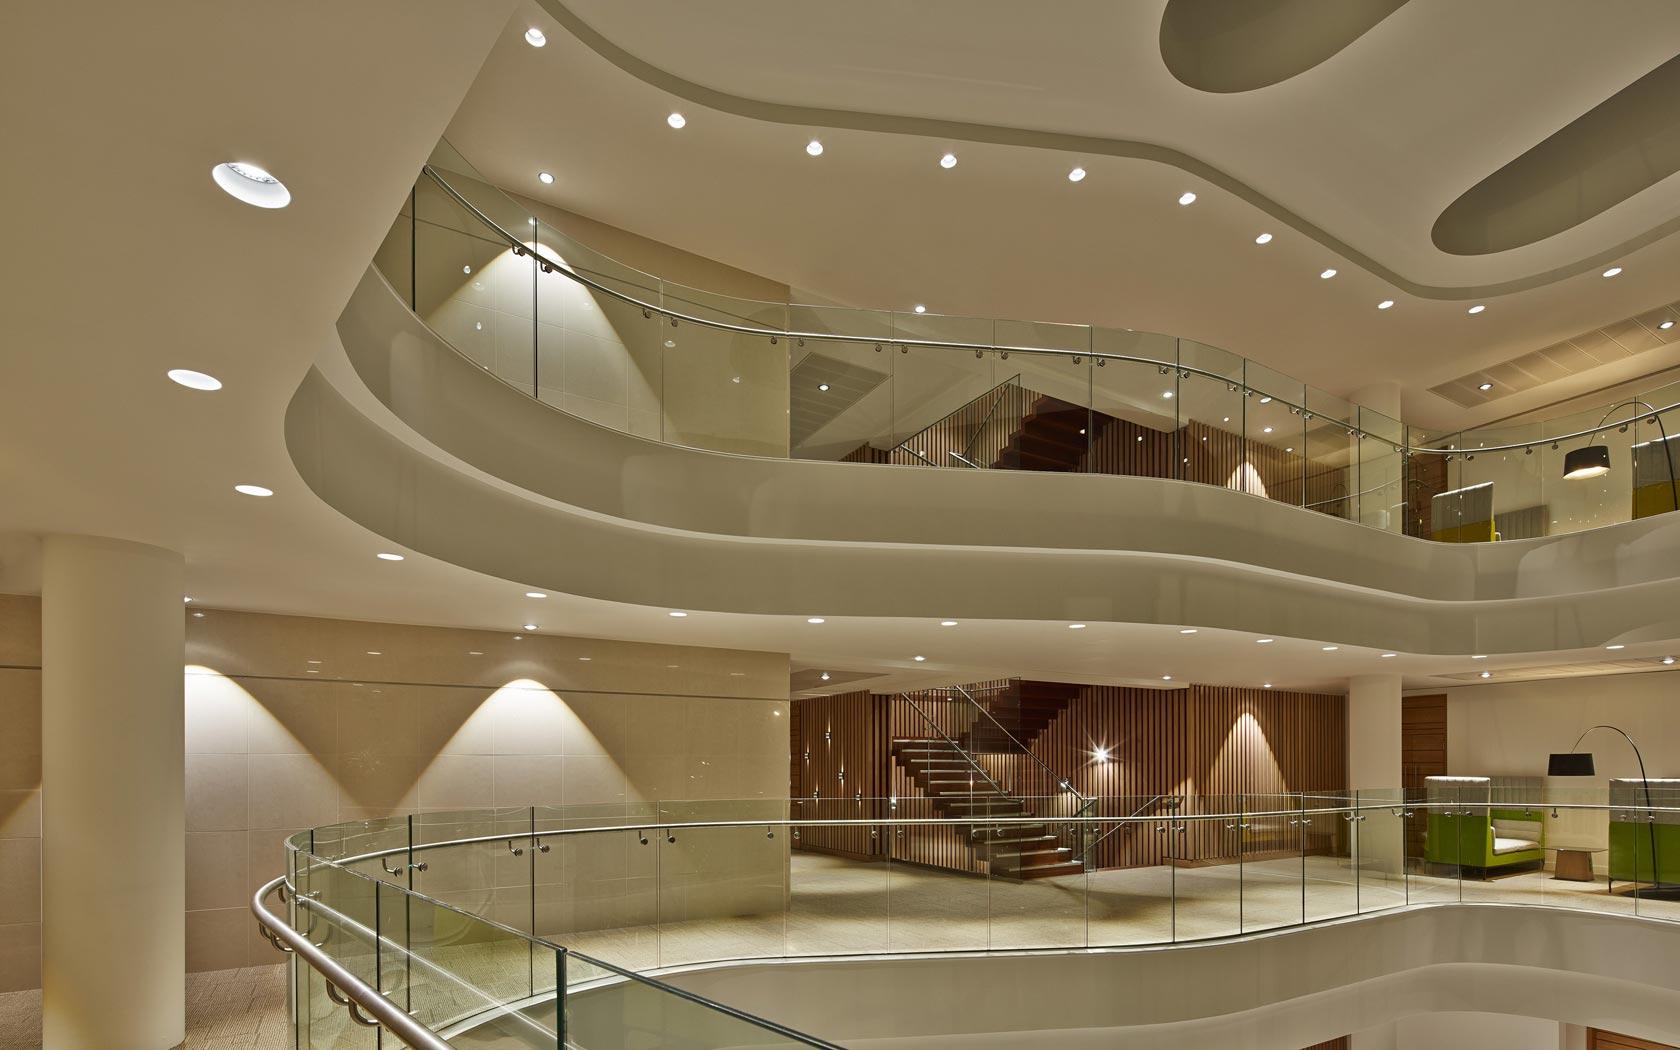 Optimale Beleuchtung Büro | Hannovers Fuhrendes Fachgeschaft In Der Beleuchtungsplanung Und